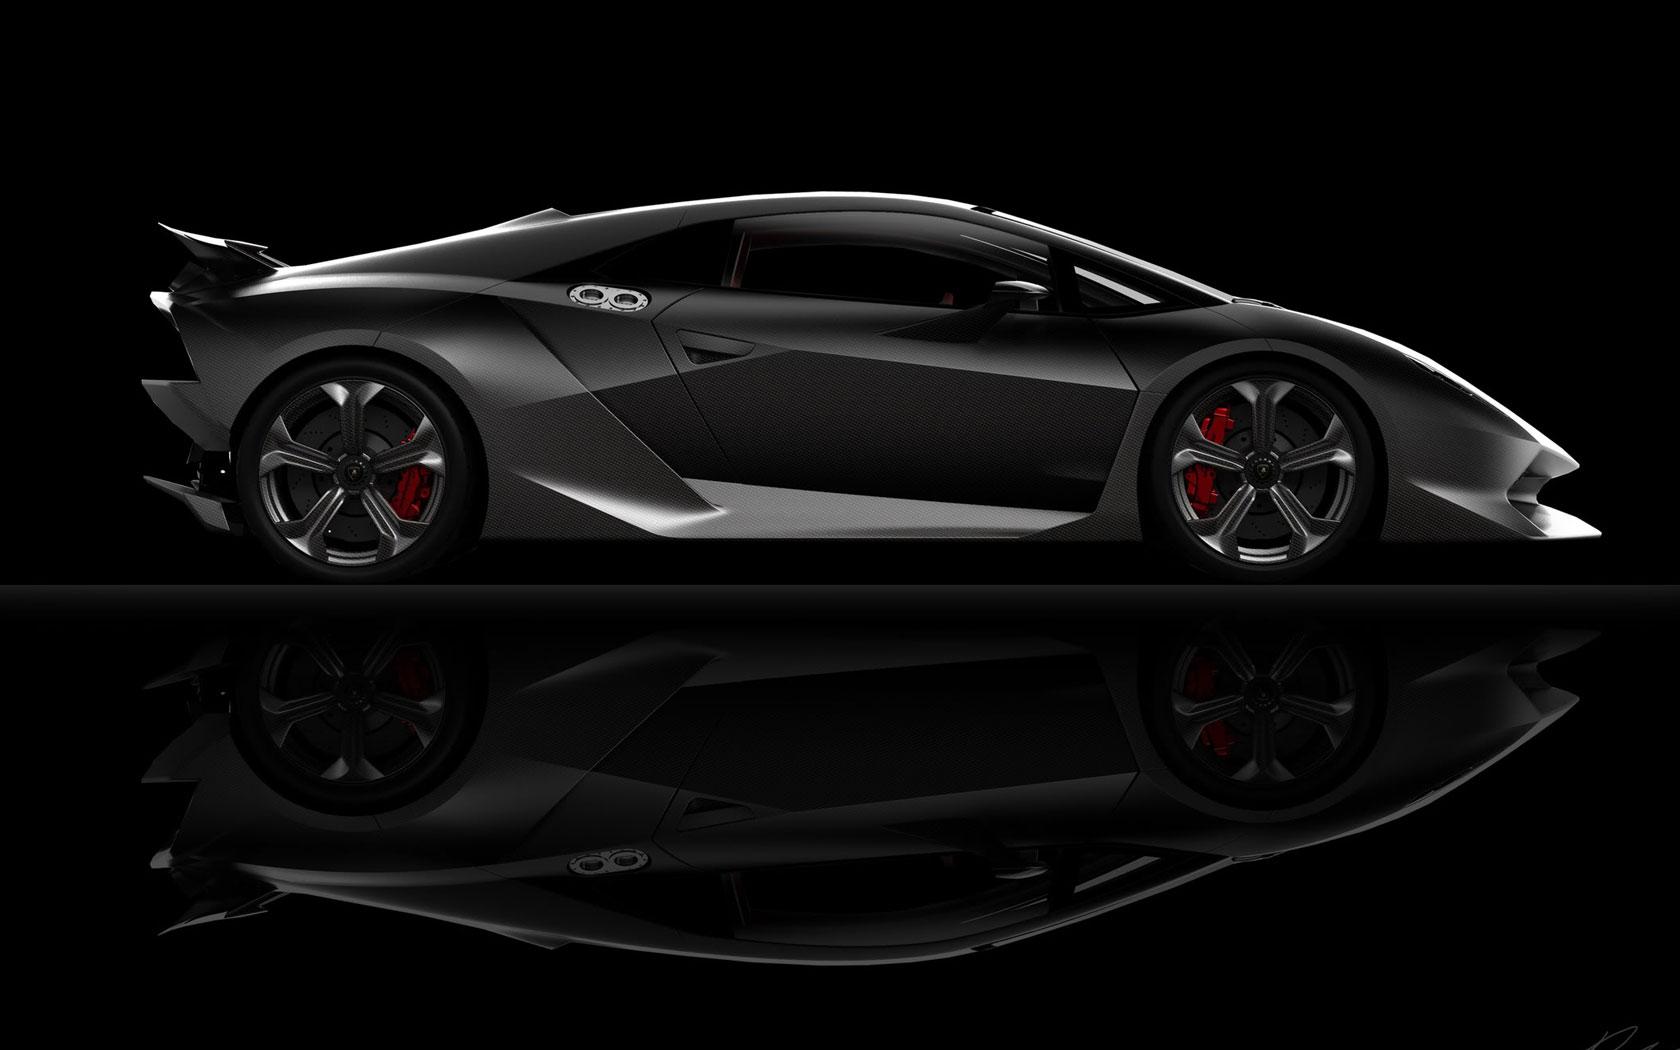 Lamborghini-Sesto-Elemento-5.jpg